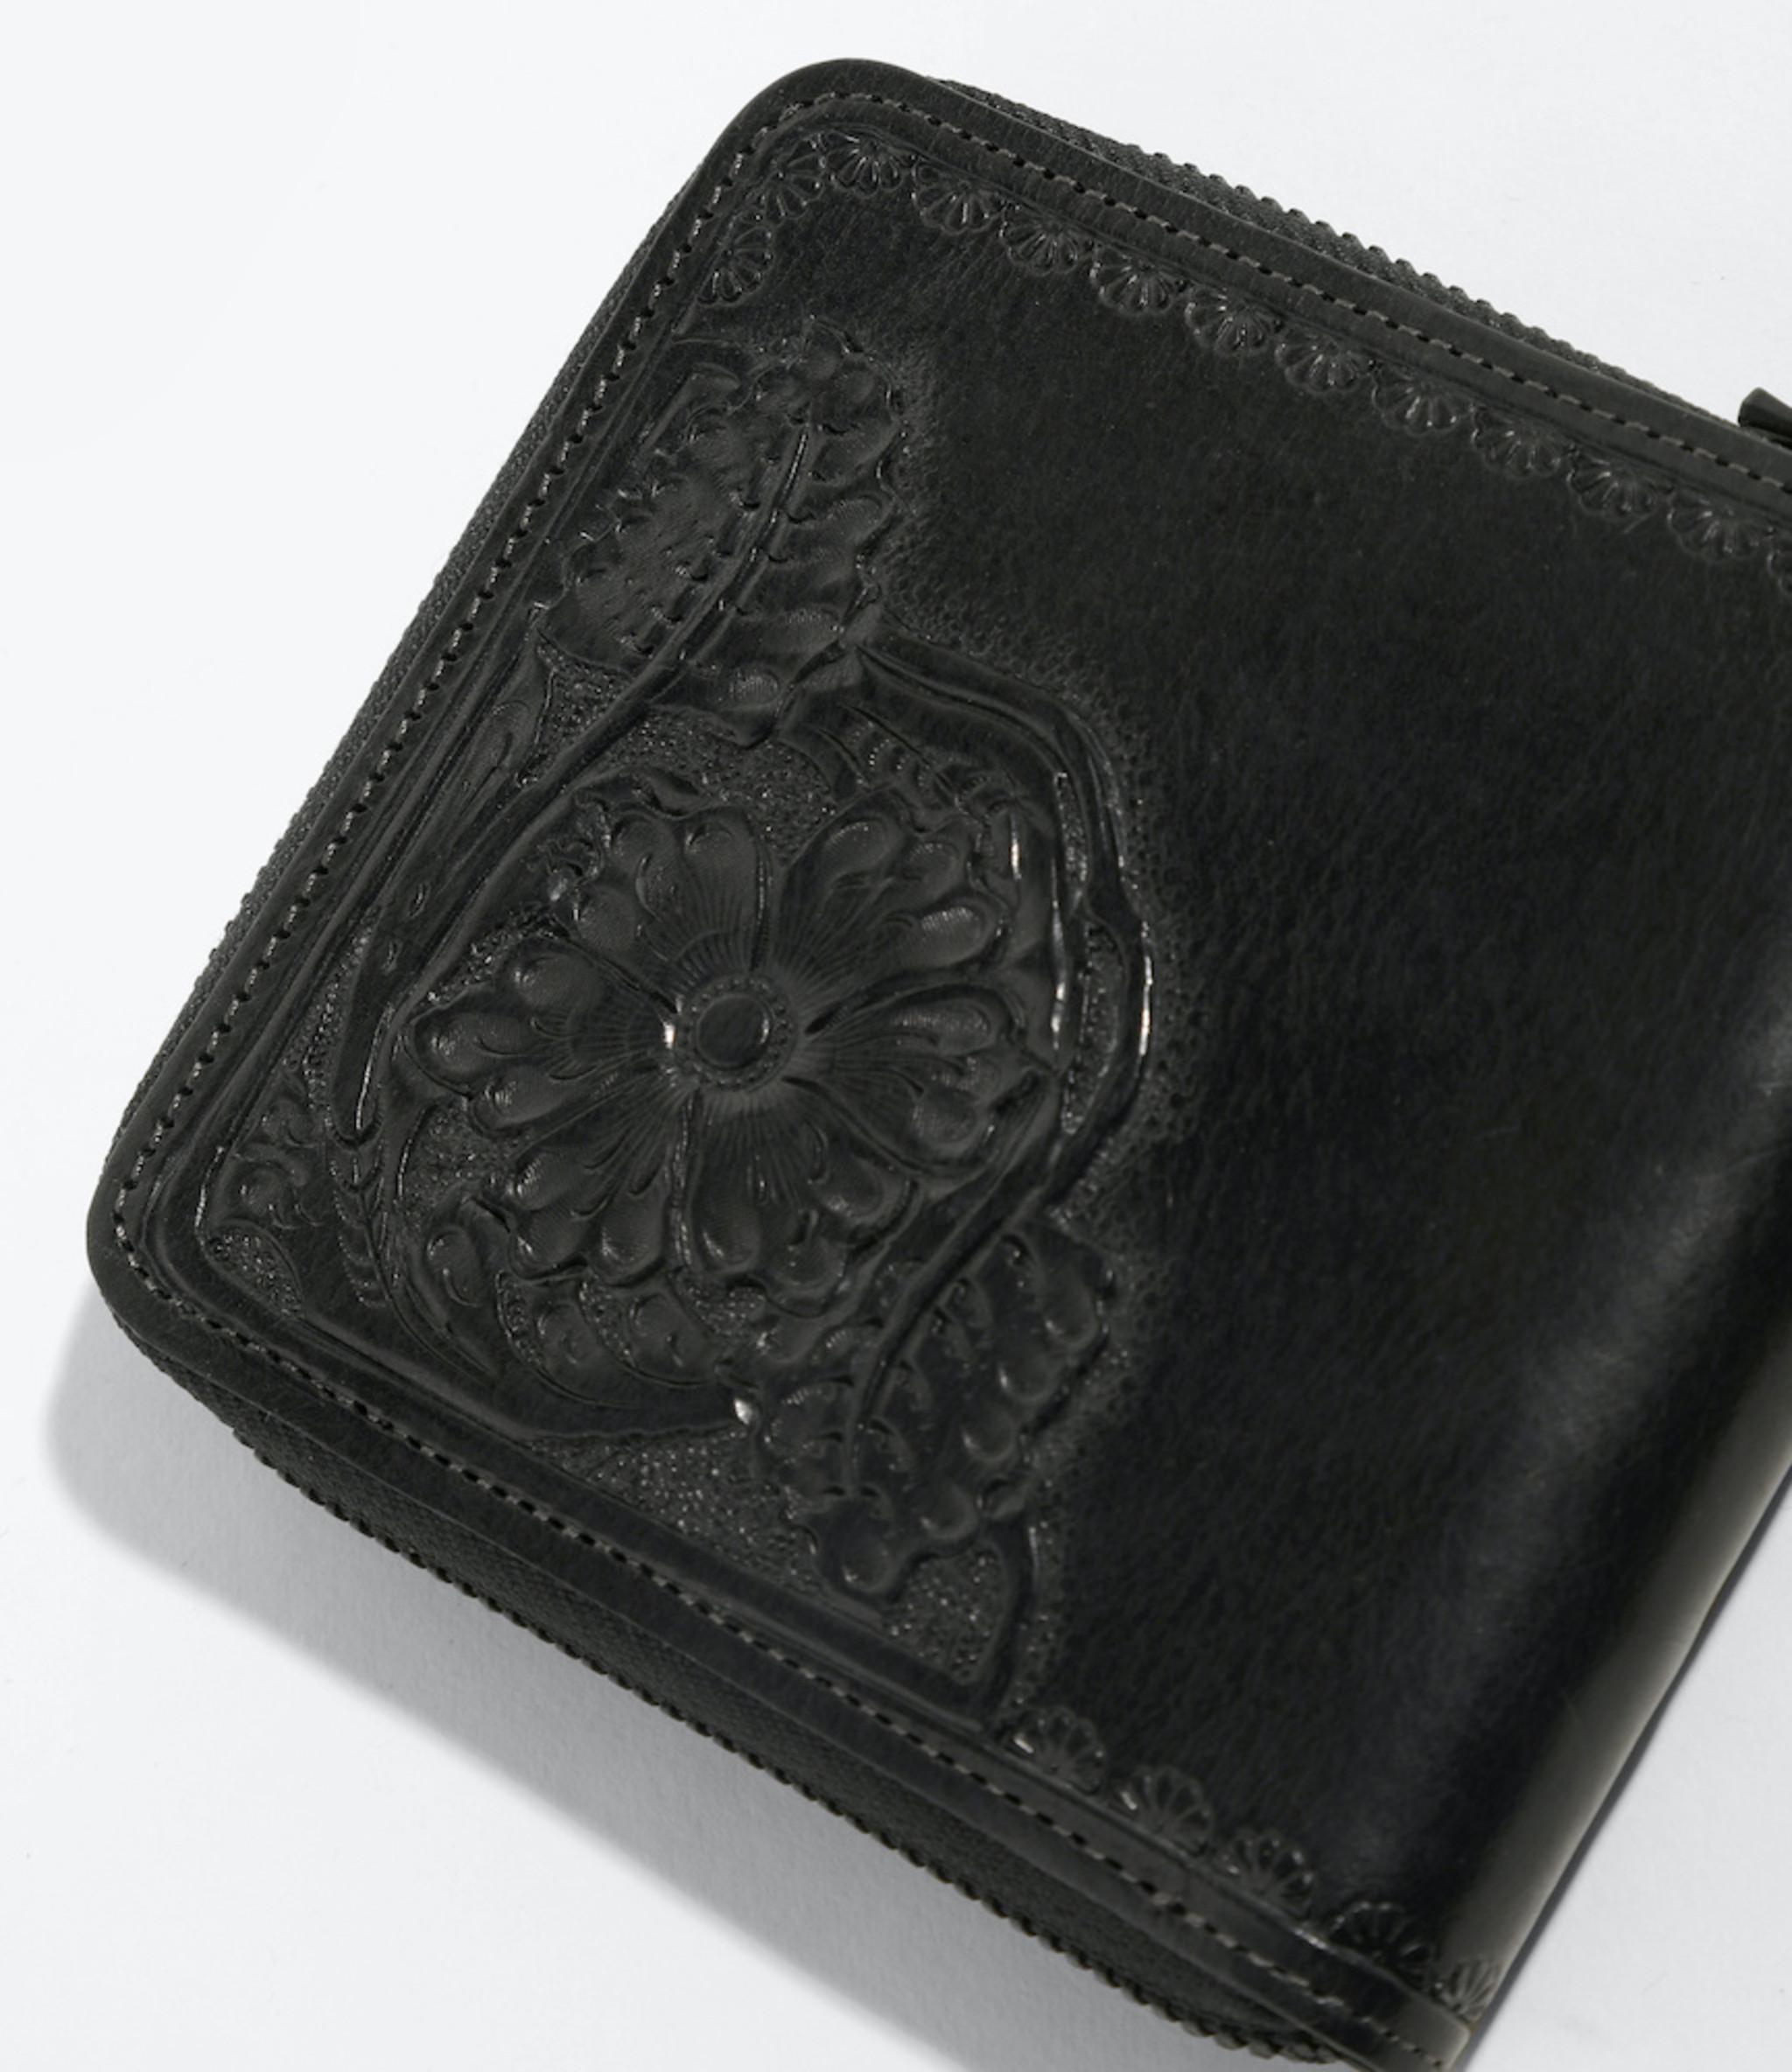 Needles Carving Sigle Wallet - Black